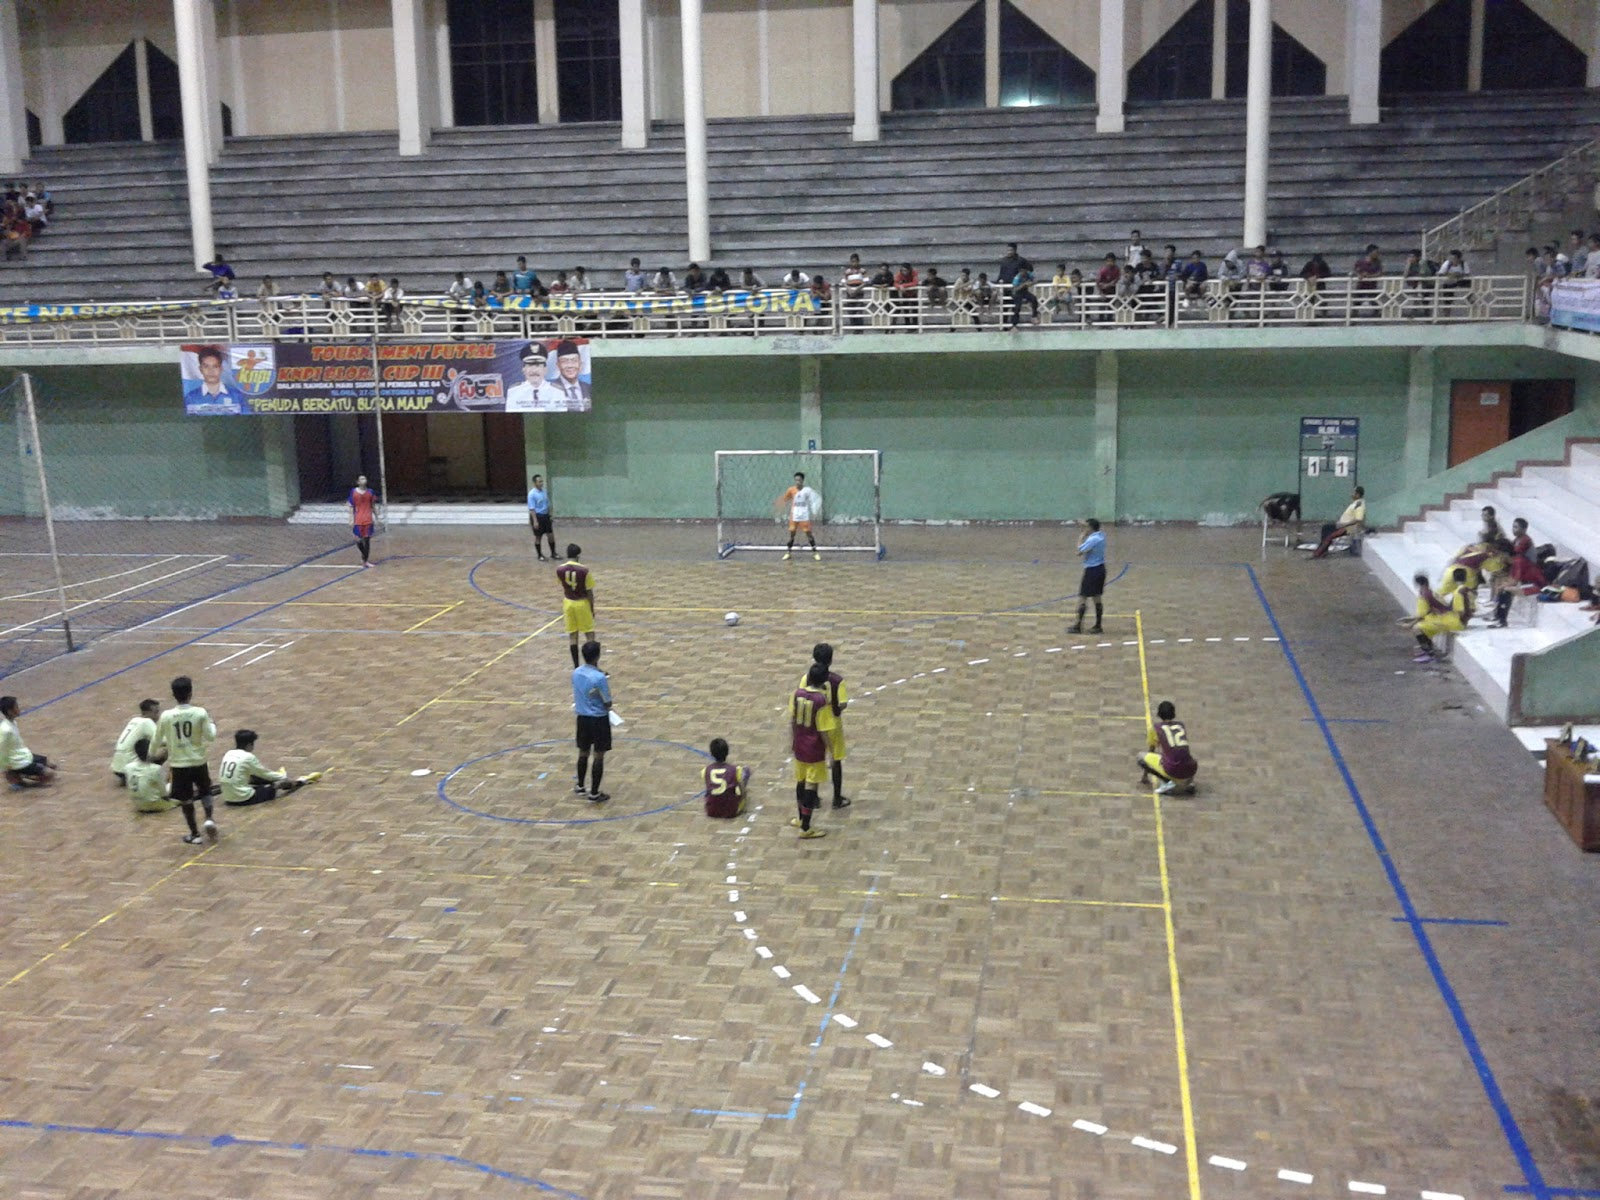 Arena Futsal Gor Mustika Blora Infoblora Terletak Jalan 1 Pertama